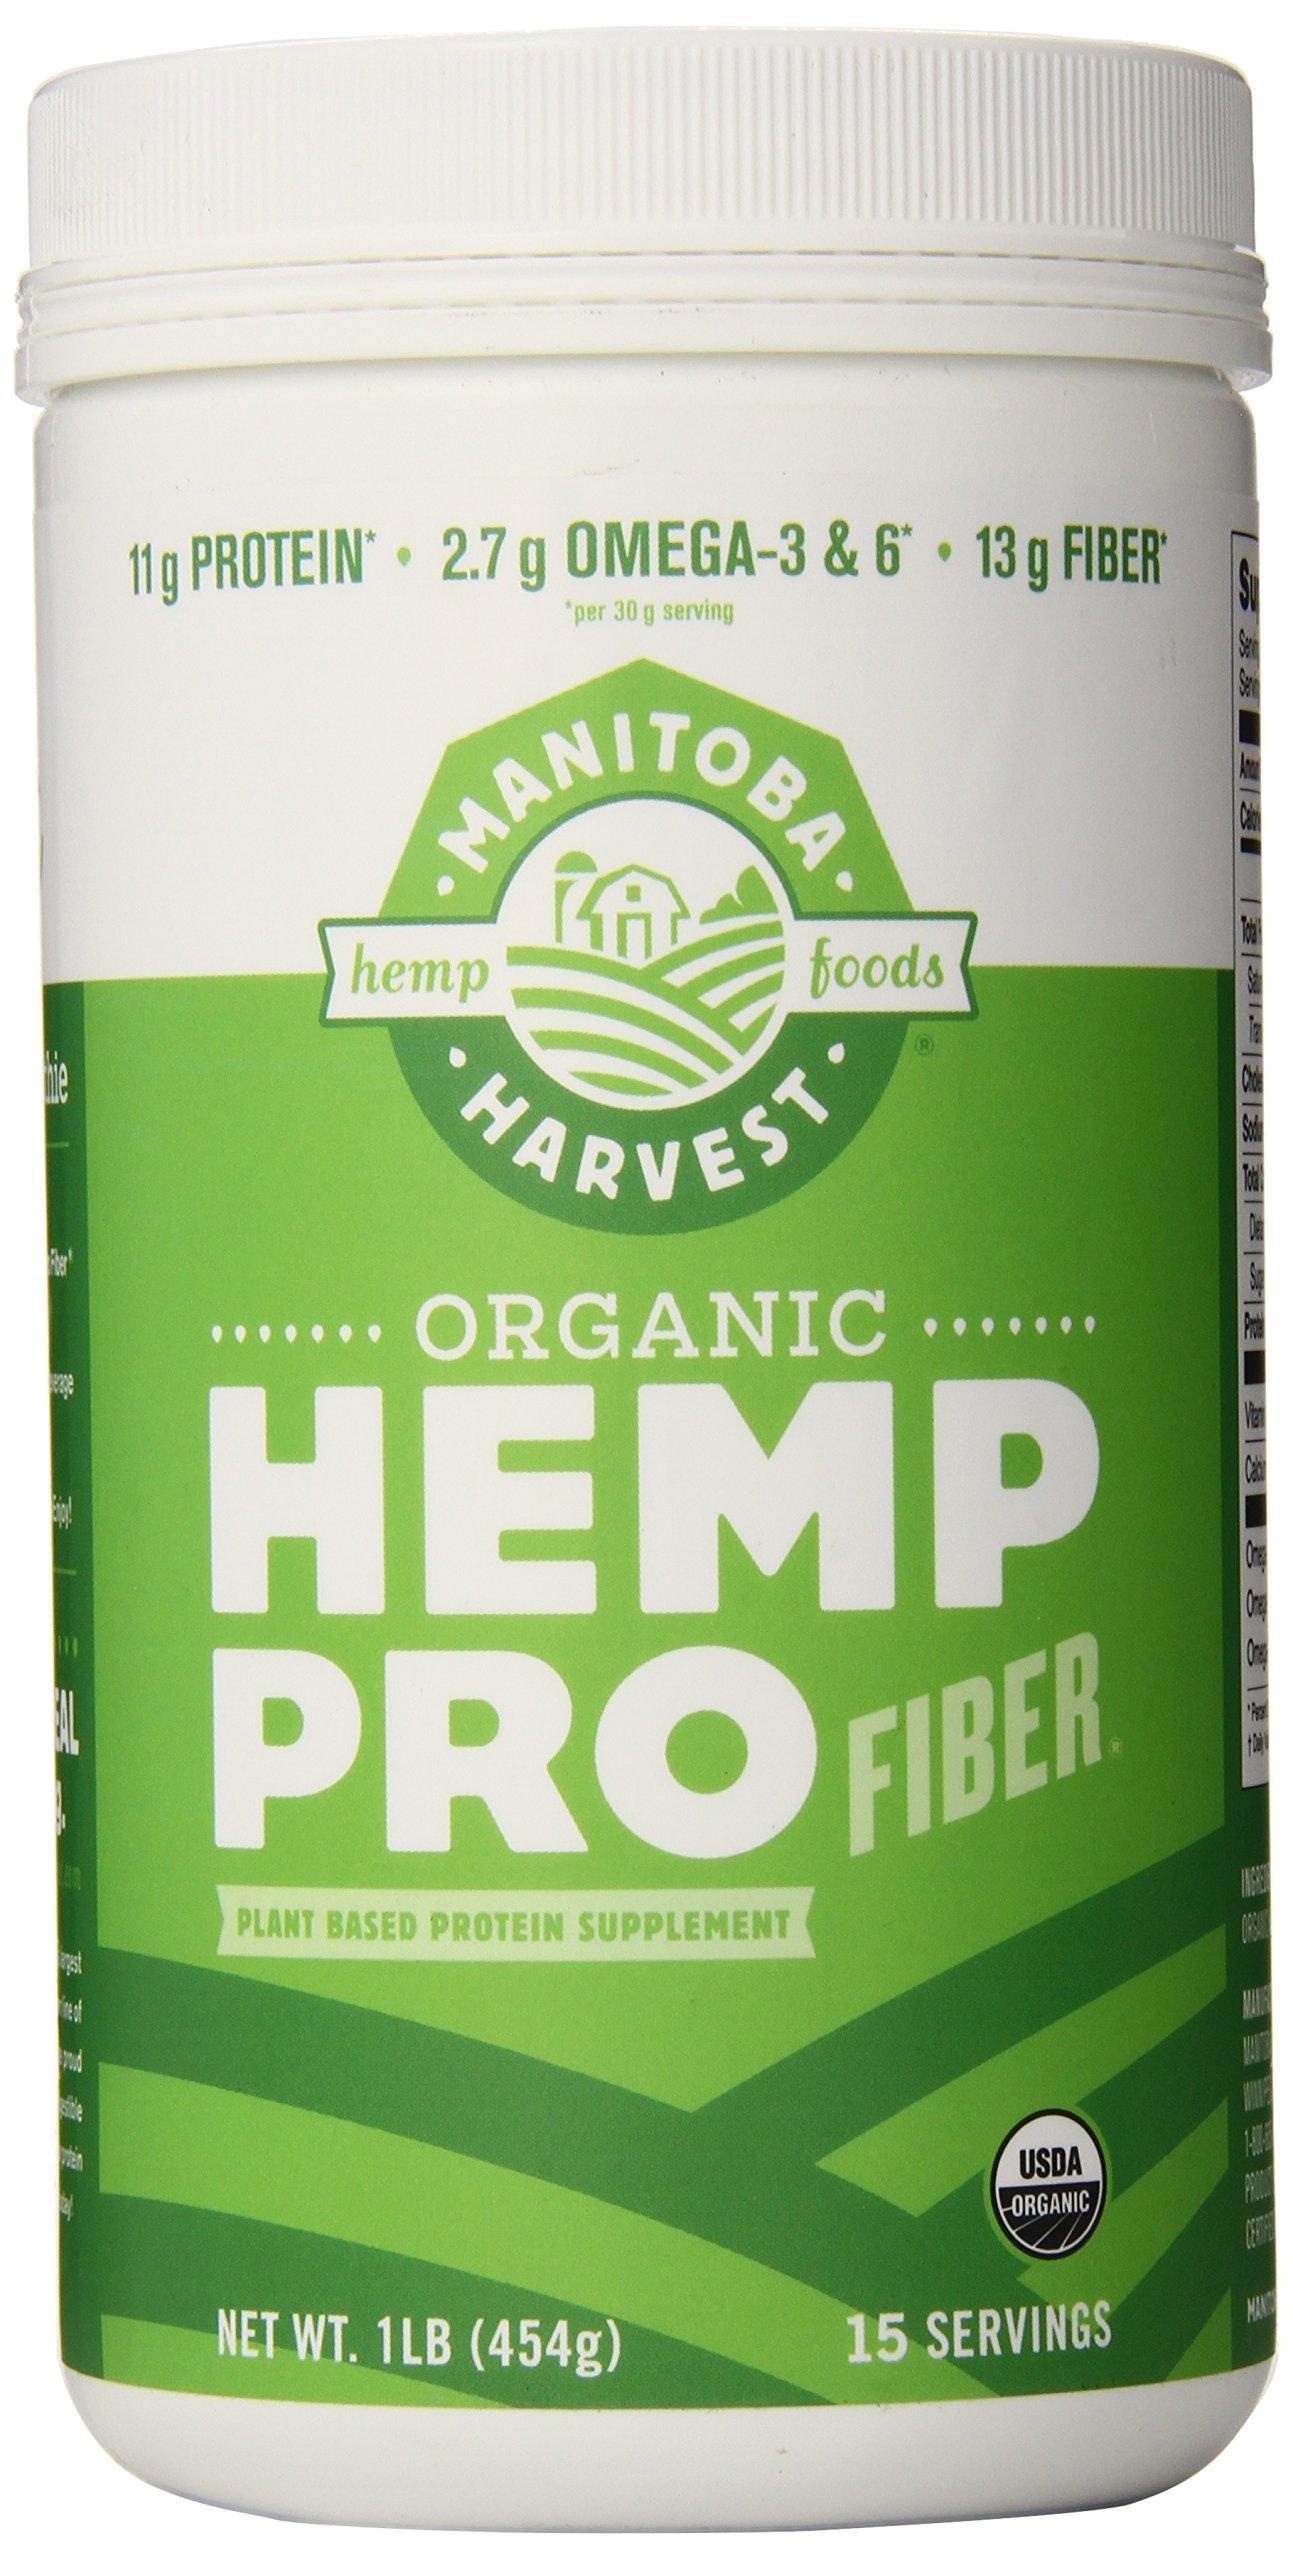 Manitoba Harvest Organic Hemp Pro Fiber Protein Powder, 16oz; with 13g of Fiber & 11g Protein per Serving, Preservative Free, Non-GMO